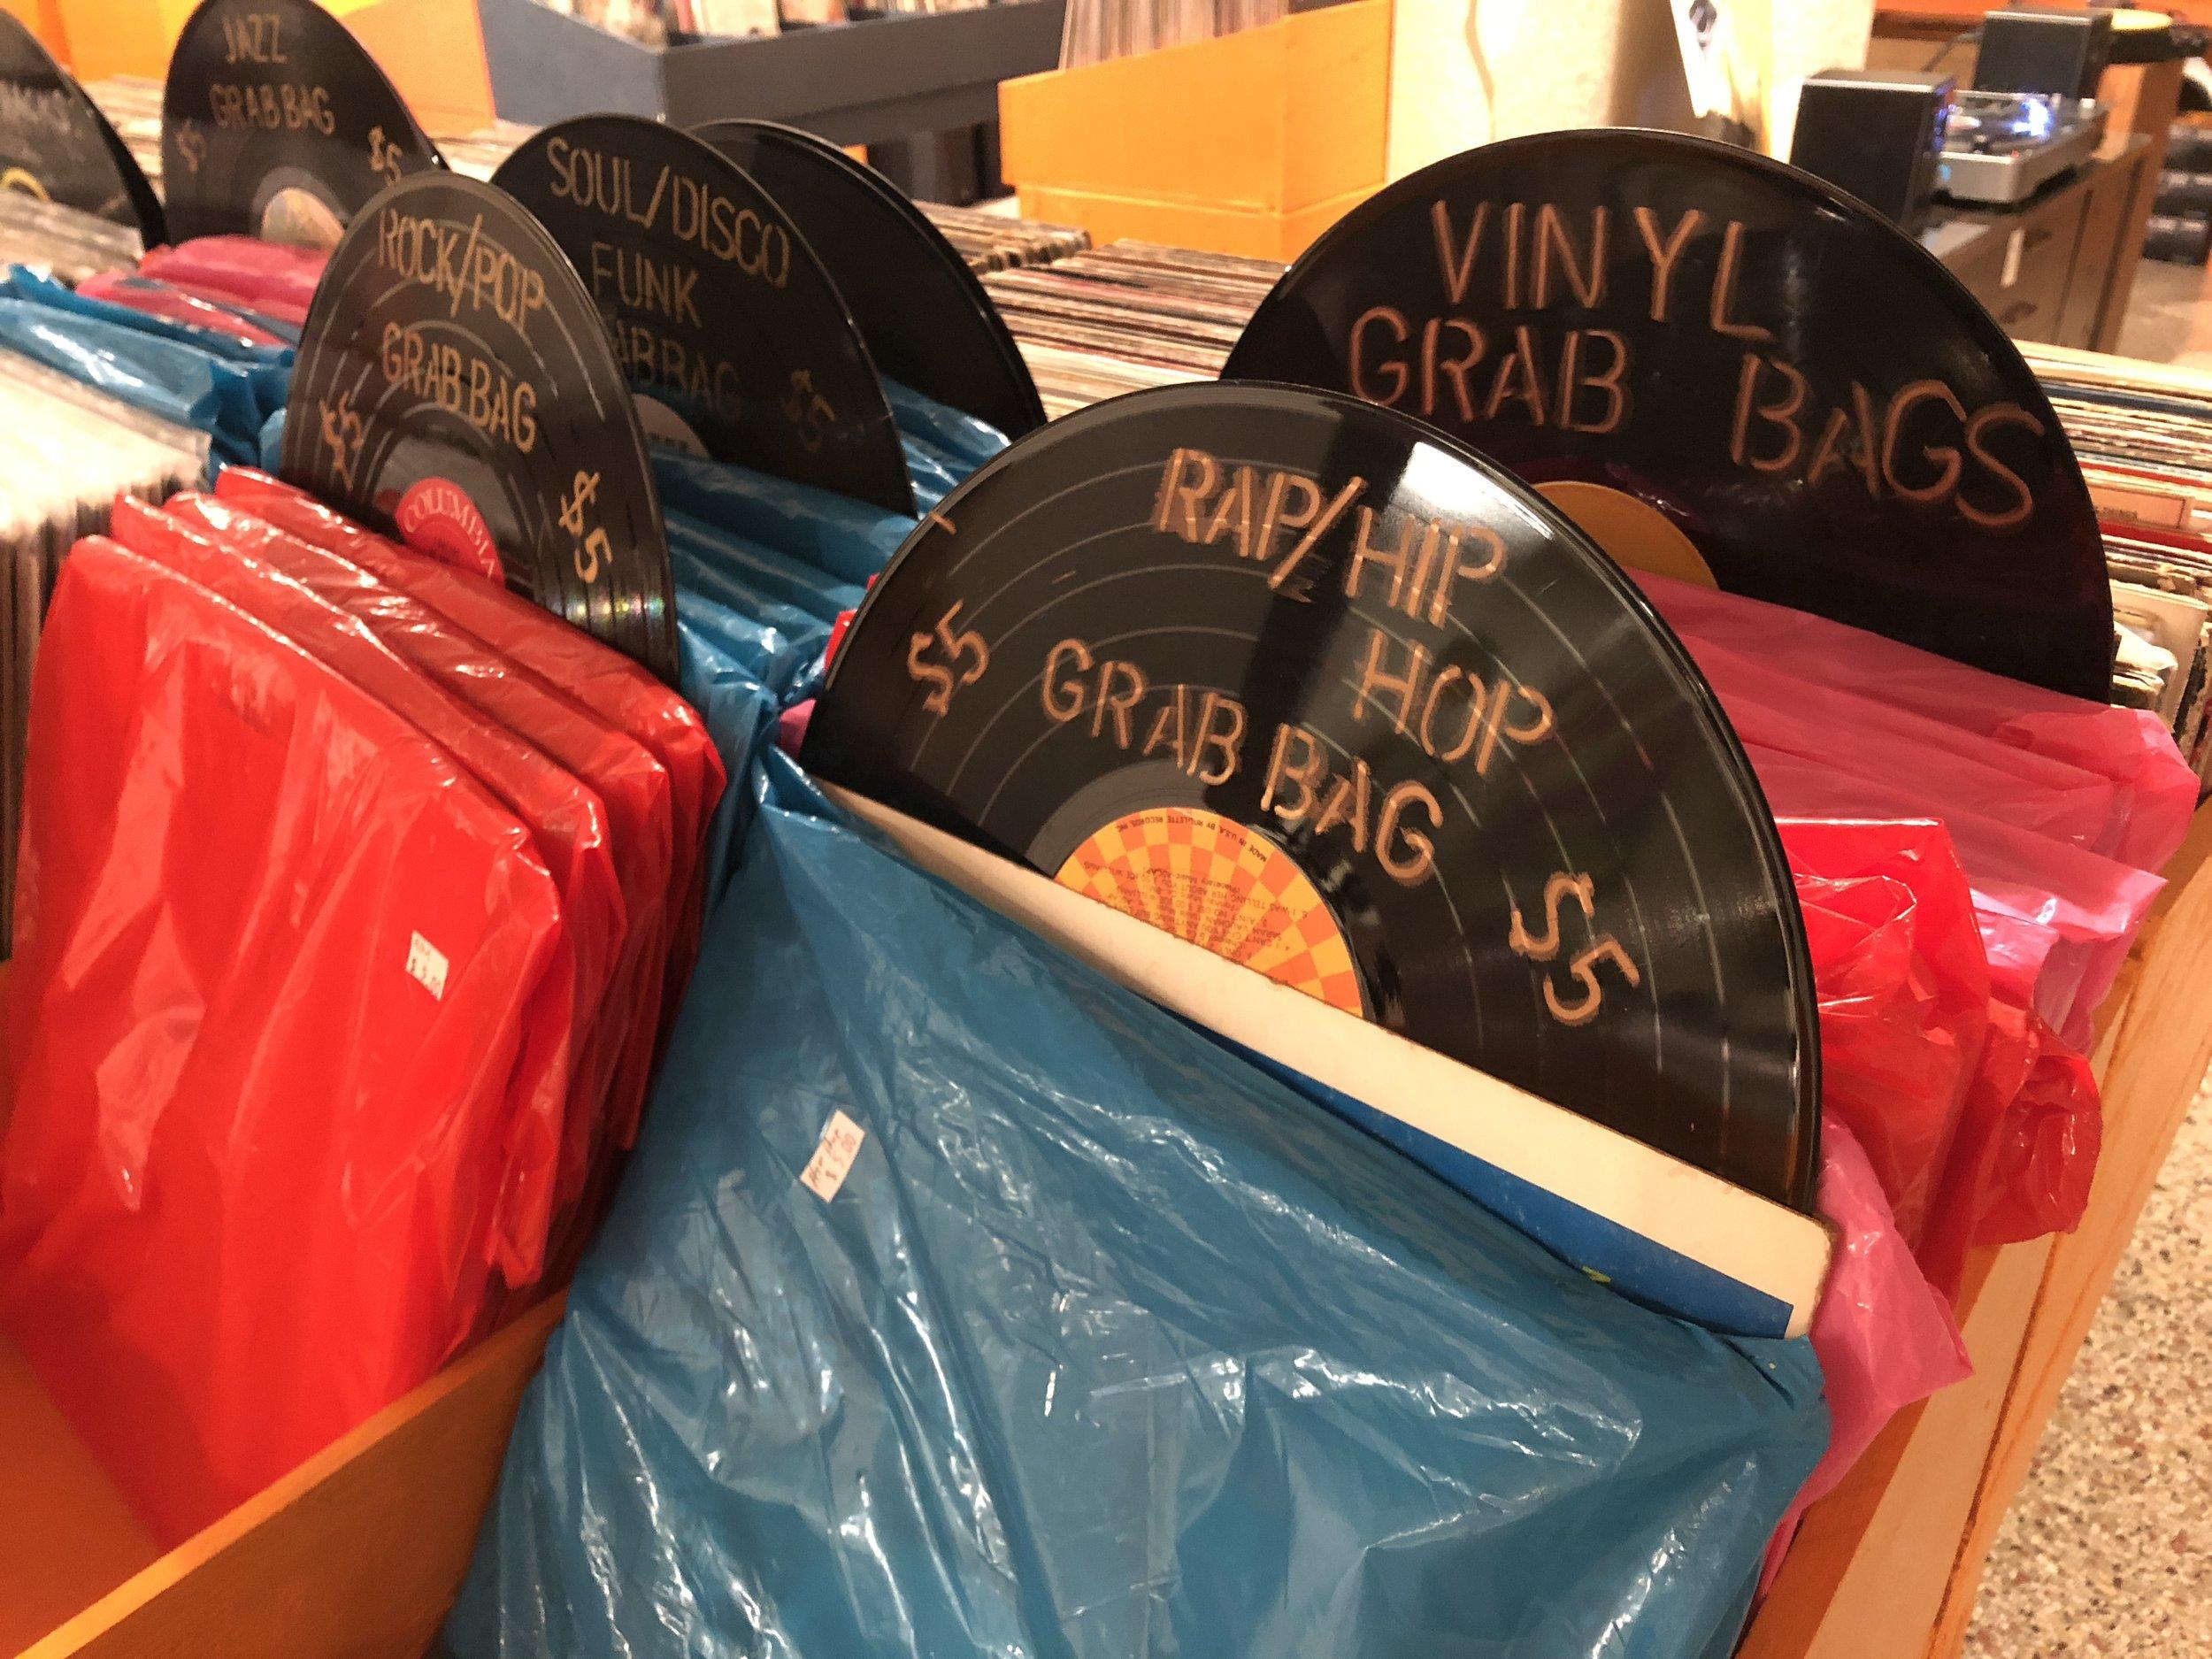 WILD AT HEART? $5 RECORD GRAB BAGS.